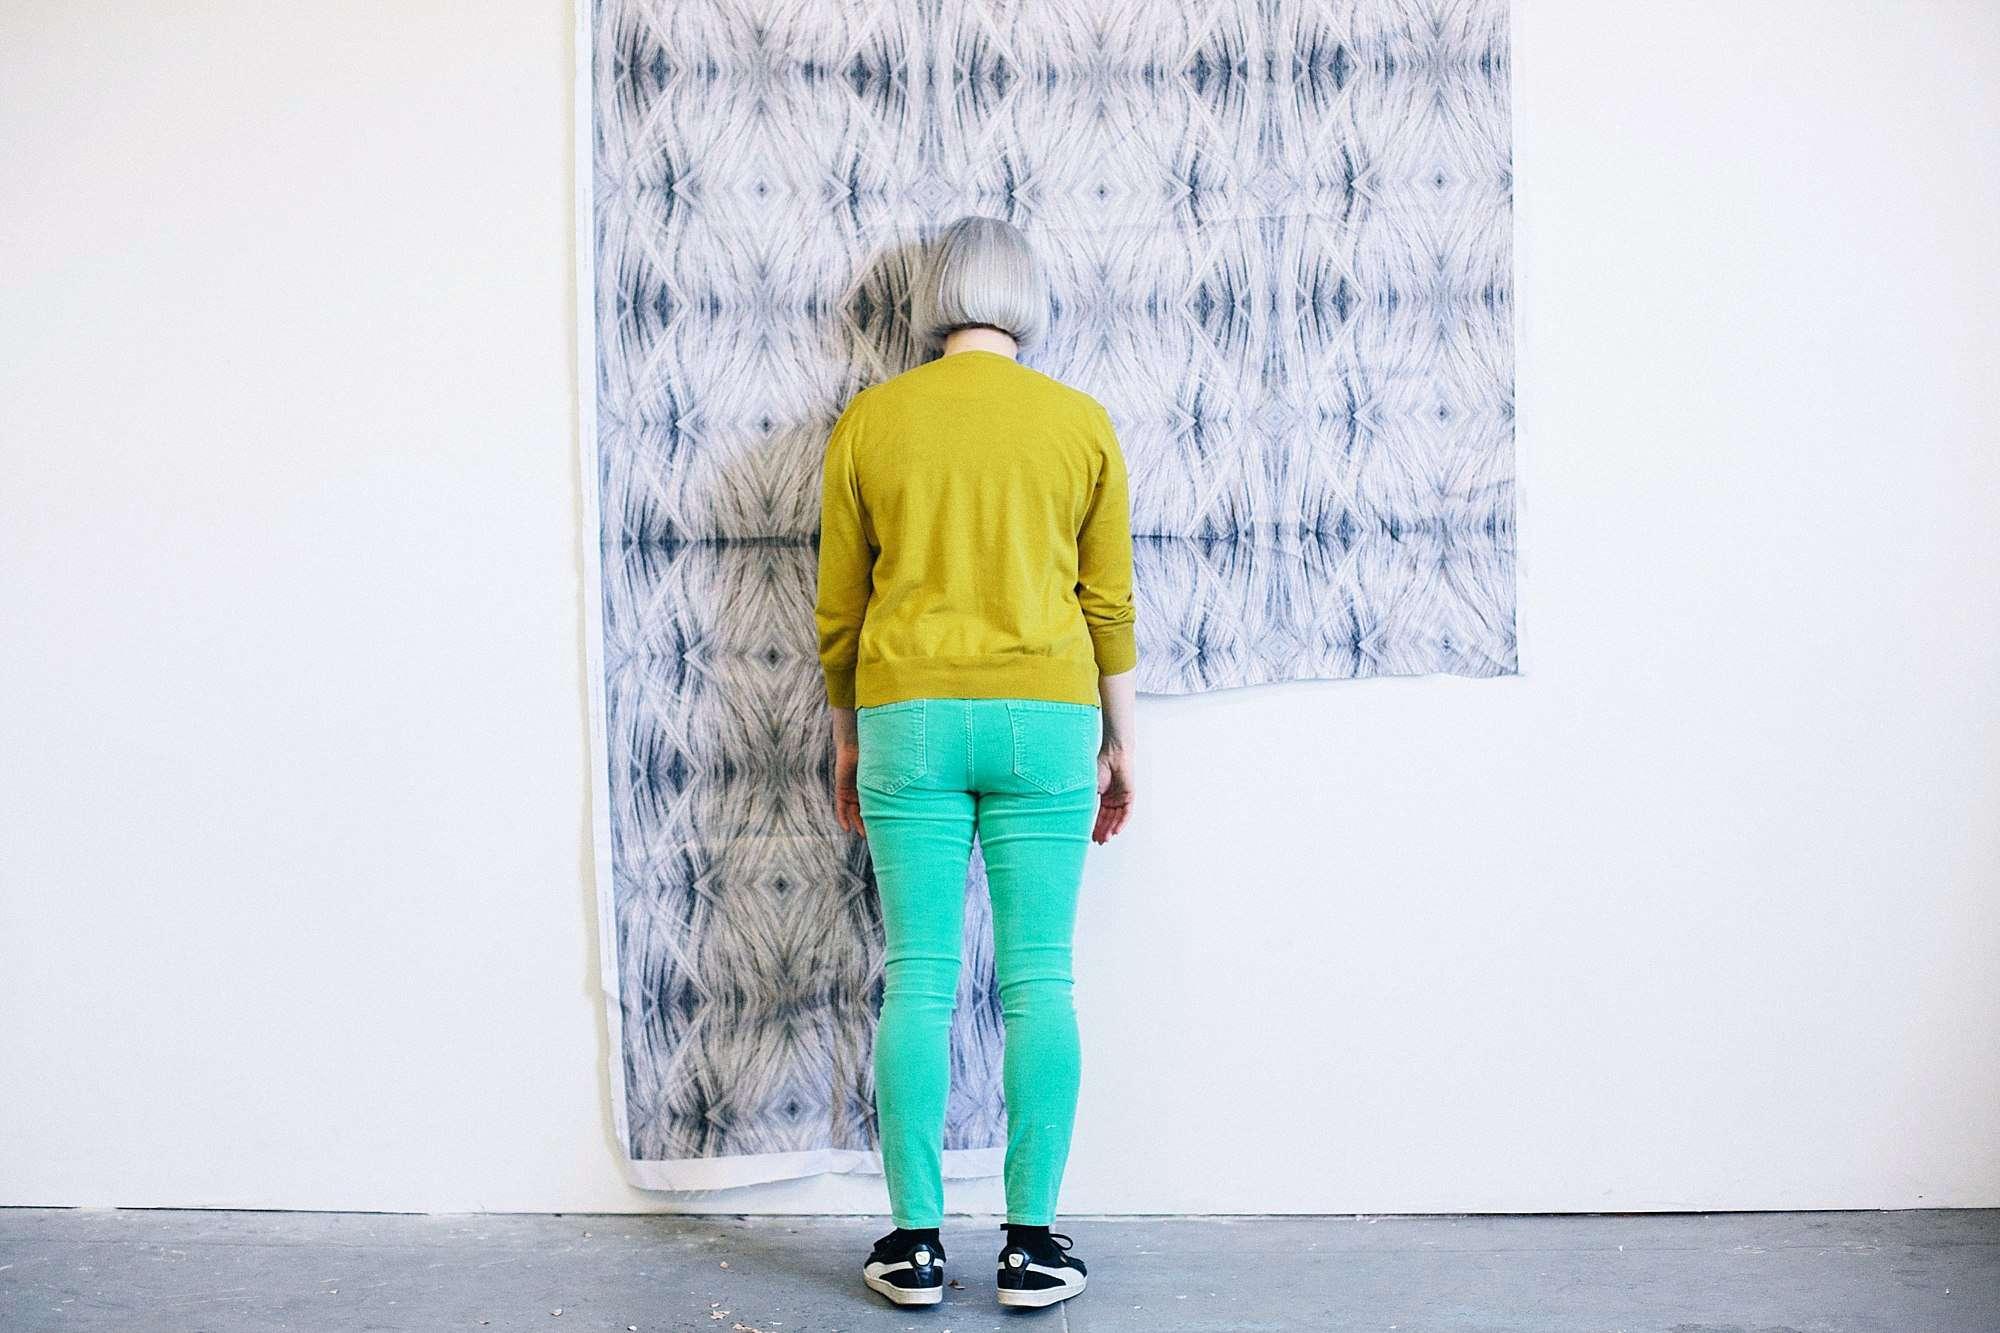 Larassa Kabel Portraits